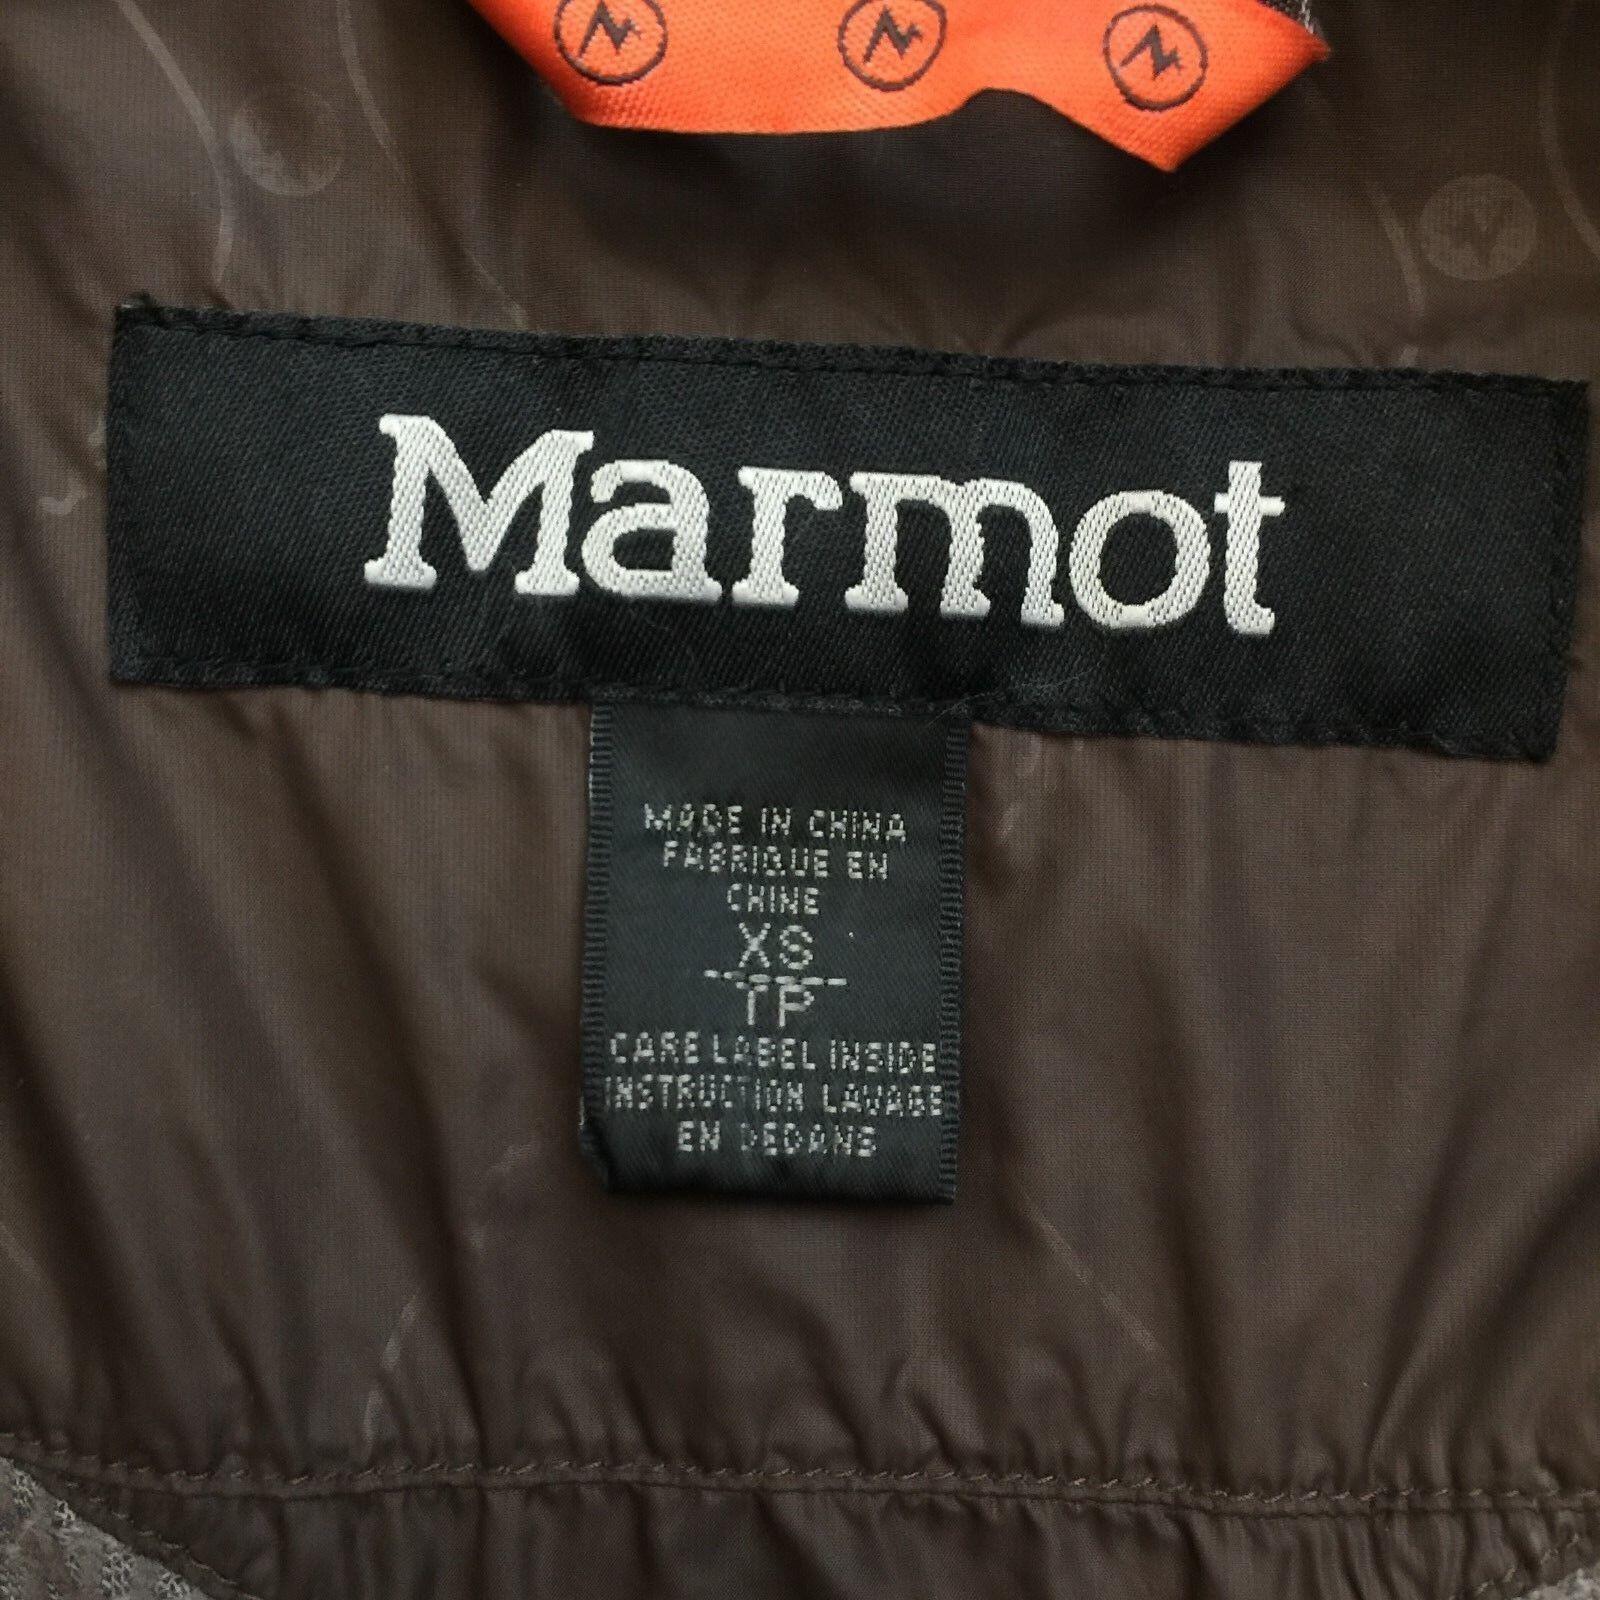 MARMOT GORE-TEX PERFORMANCE PERFORMANCE PERFORMANCE SHELL RUST BROWN WOMEN'S  XS 90ef64